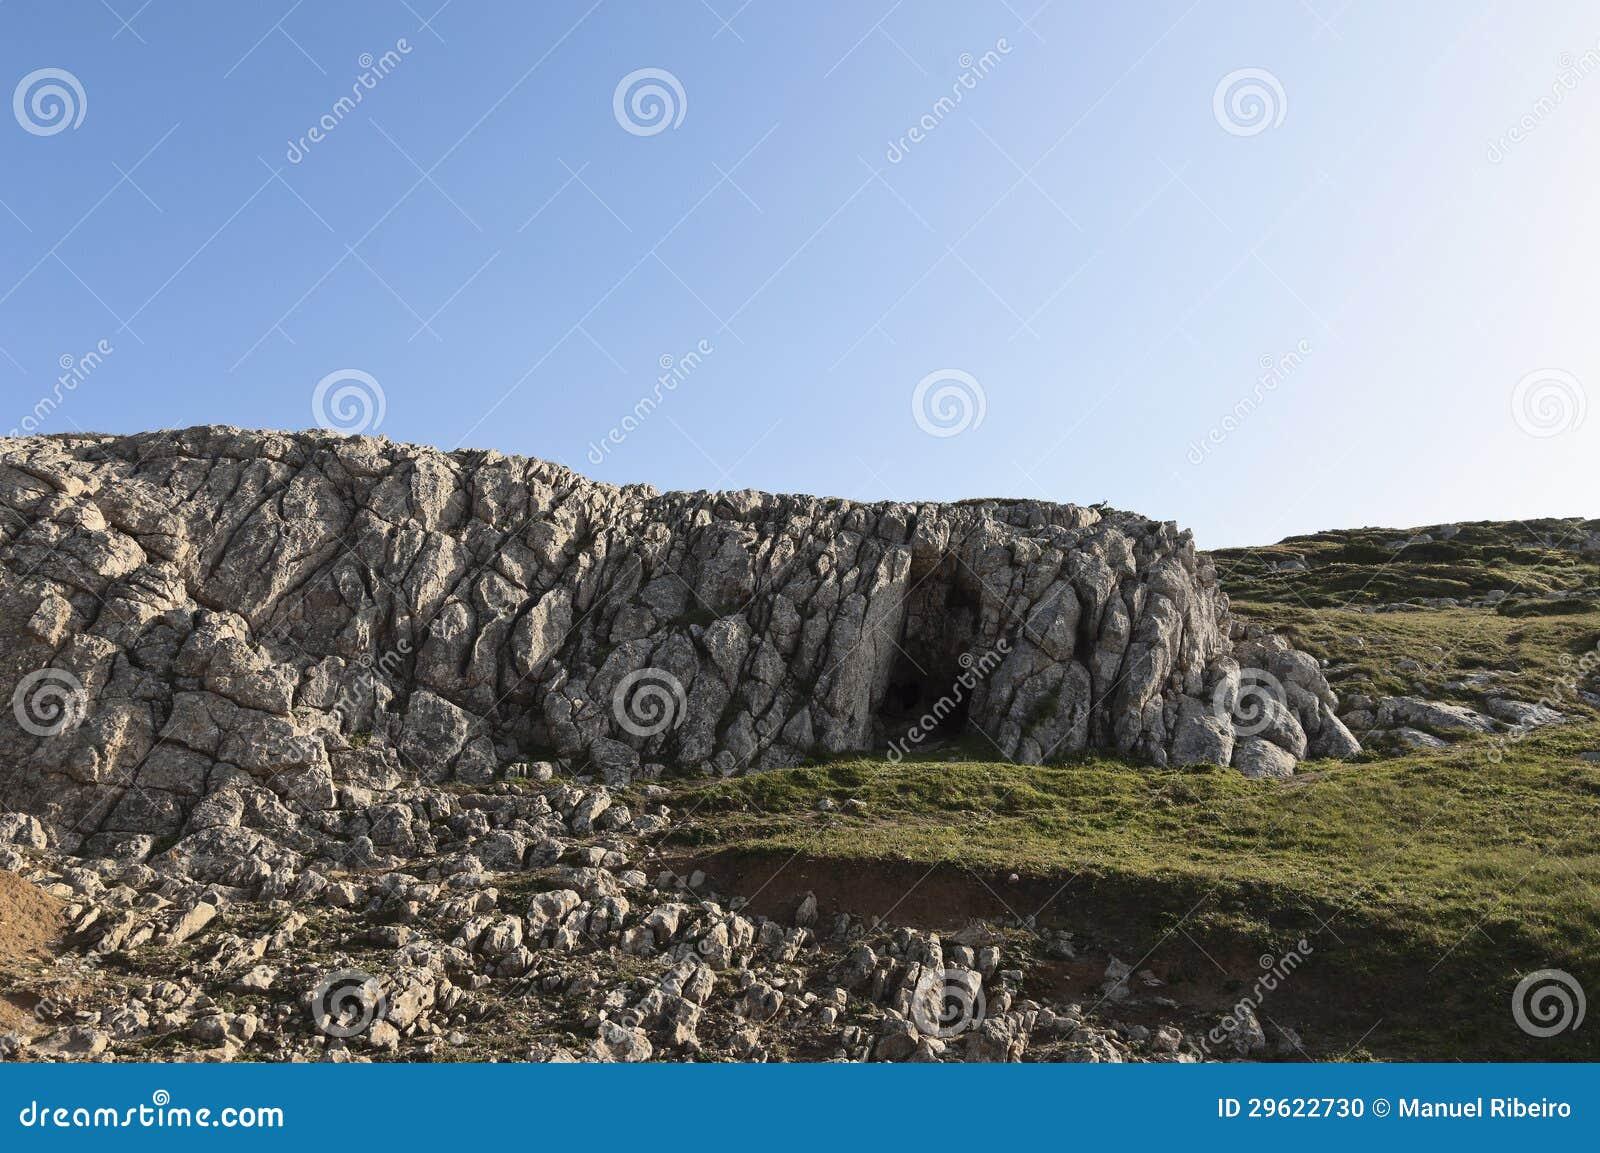 Limestone Formation Stock Photo - Image: 29622730